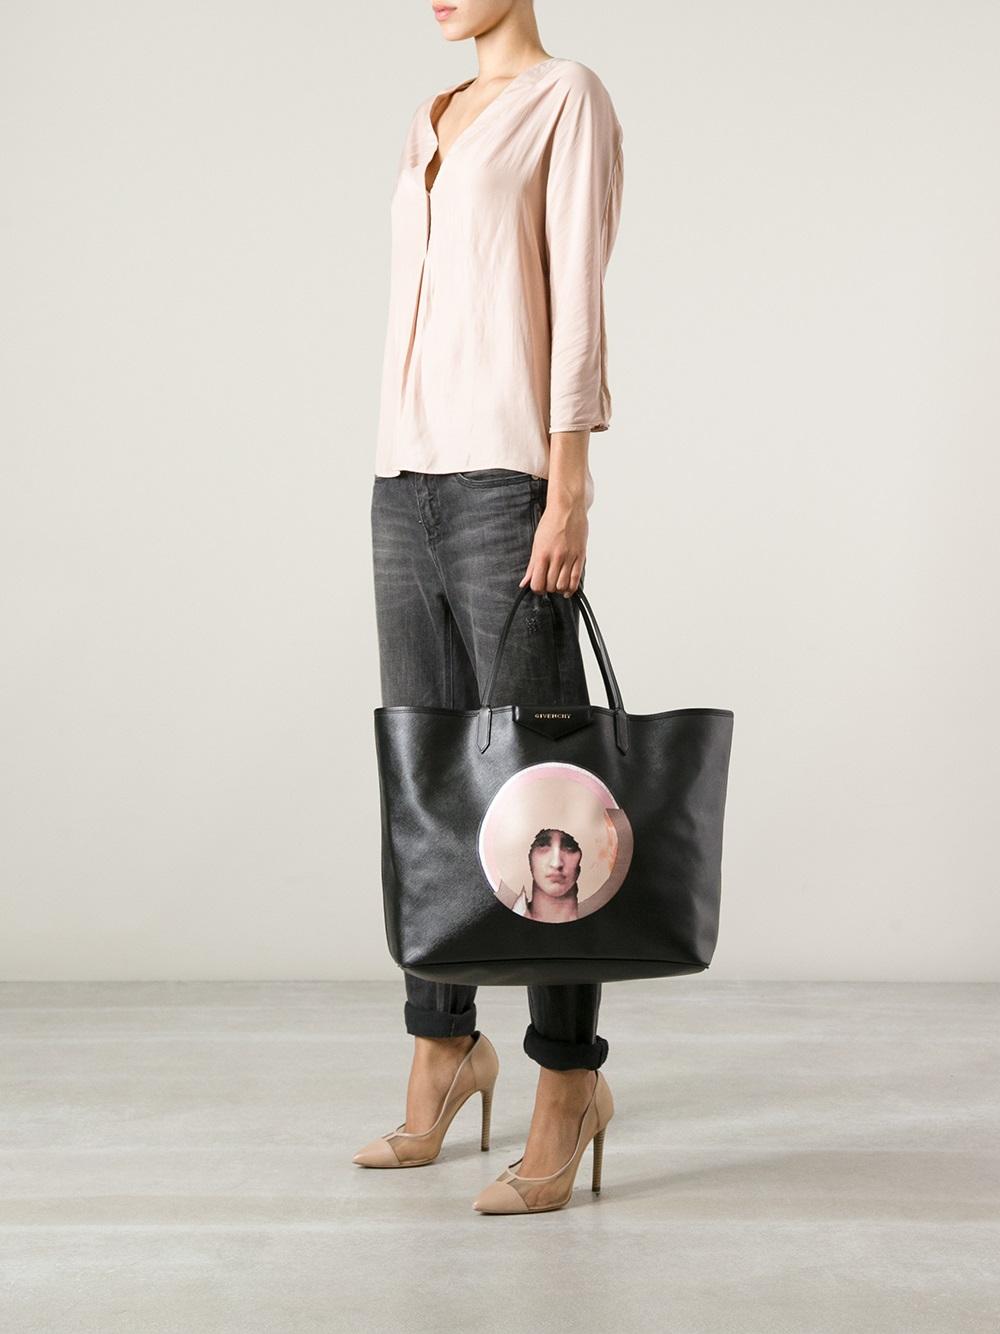 ... pretty nice c6972 46de5 Lyst Givenchy Antigona Large Ping Tote In Black  ... 3075722b5b